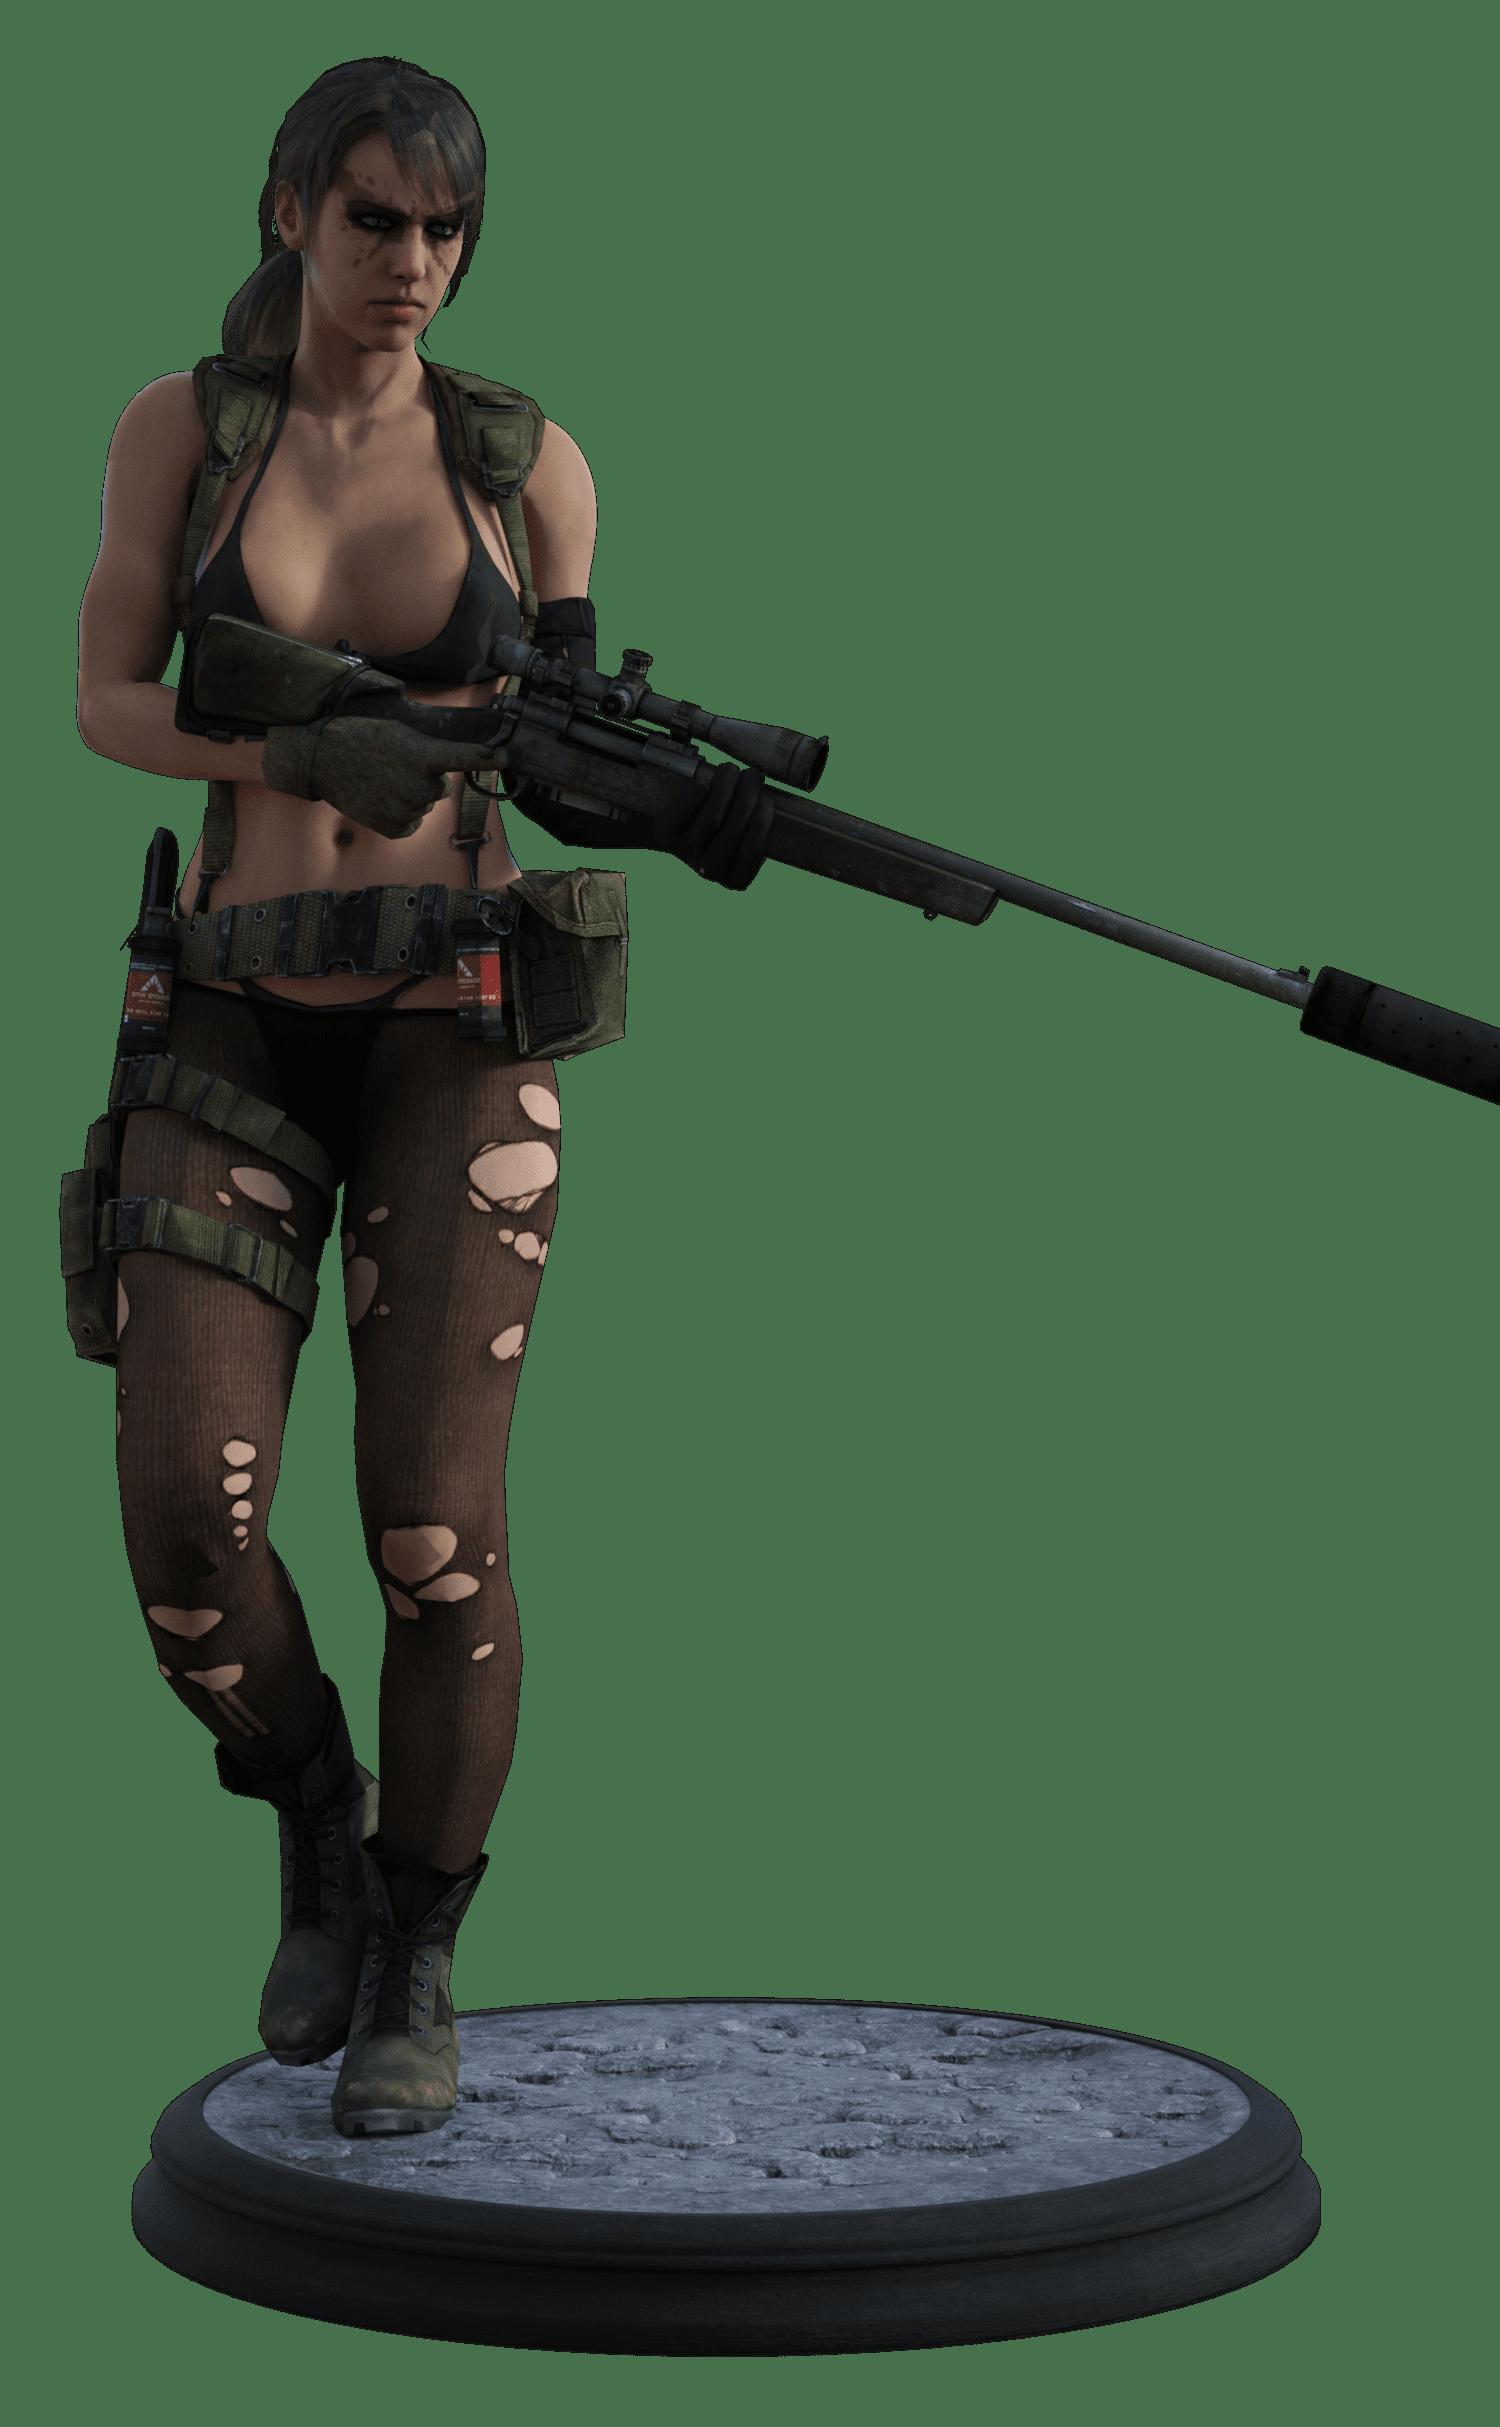 Metal Gear Solid V Quiet in Daz G8F_DAZ3D下载站